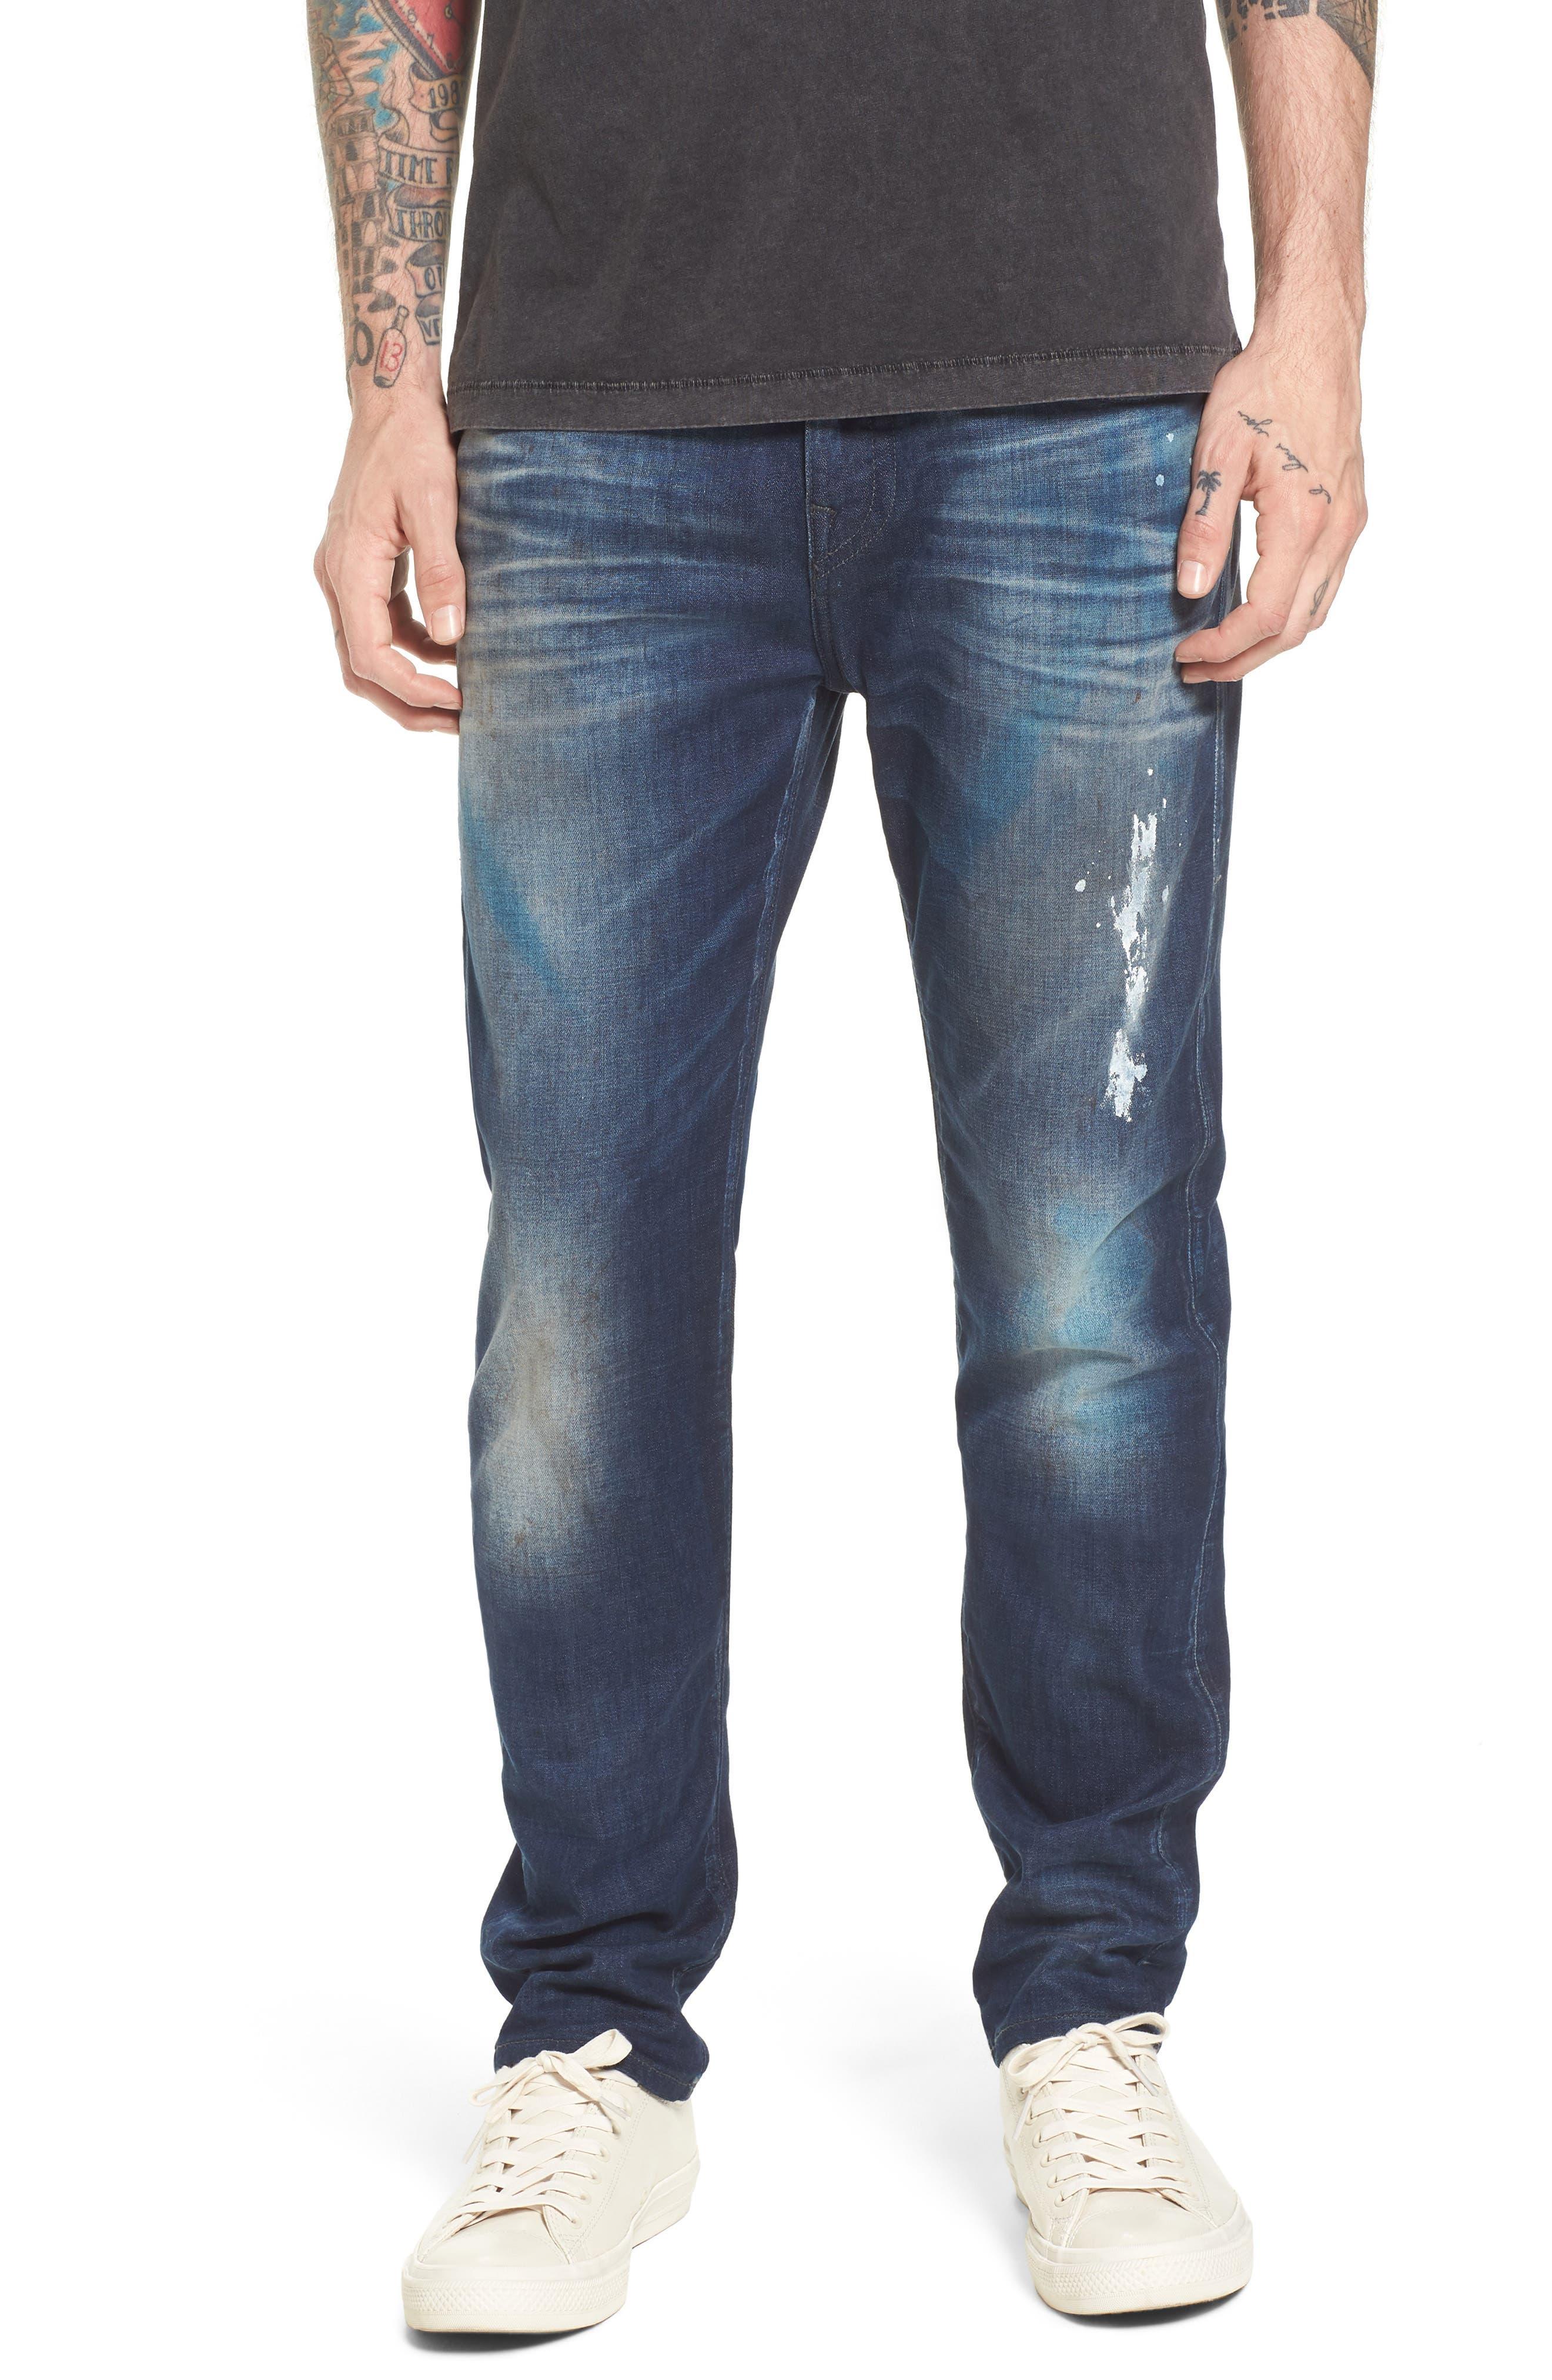 Rocco Skinny Fit Jeans,                         Main,                         color, Loft Edge